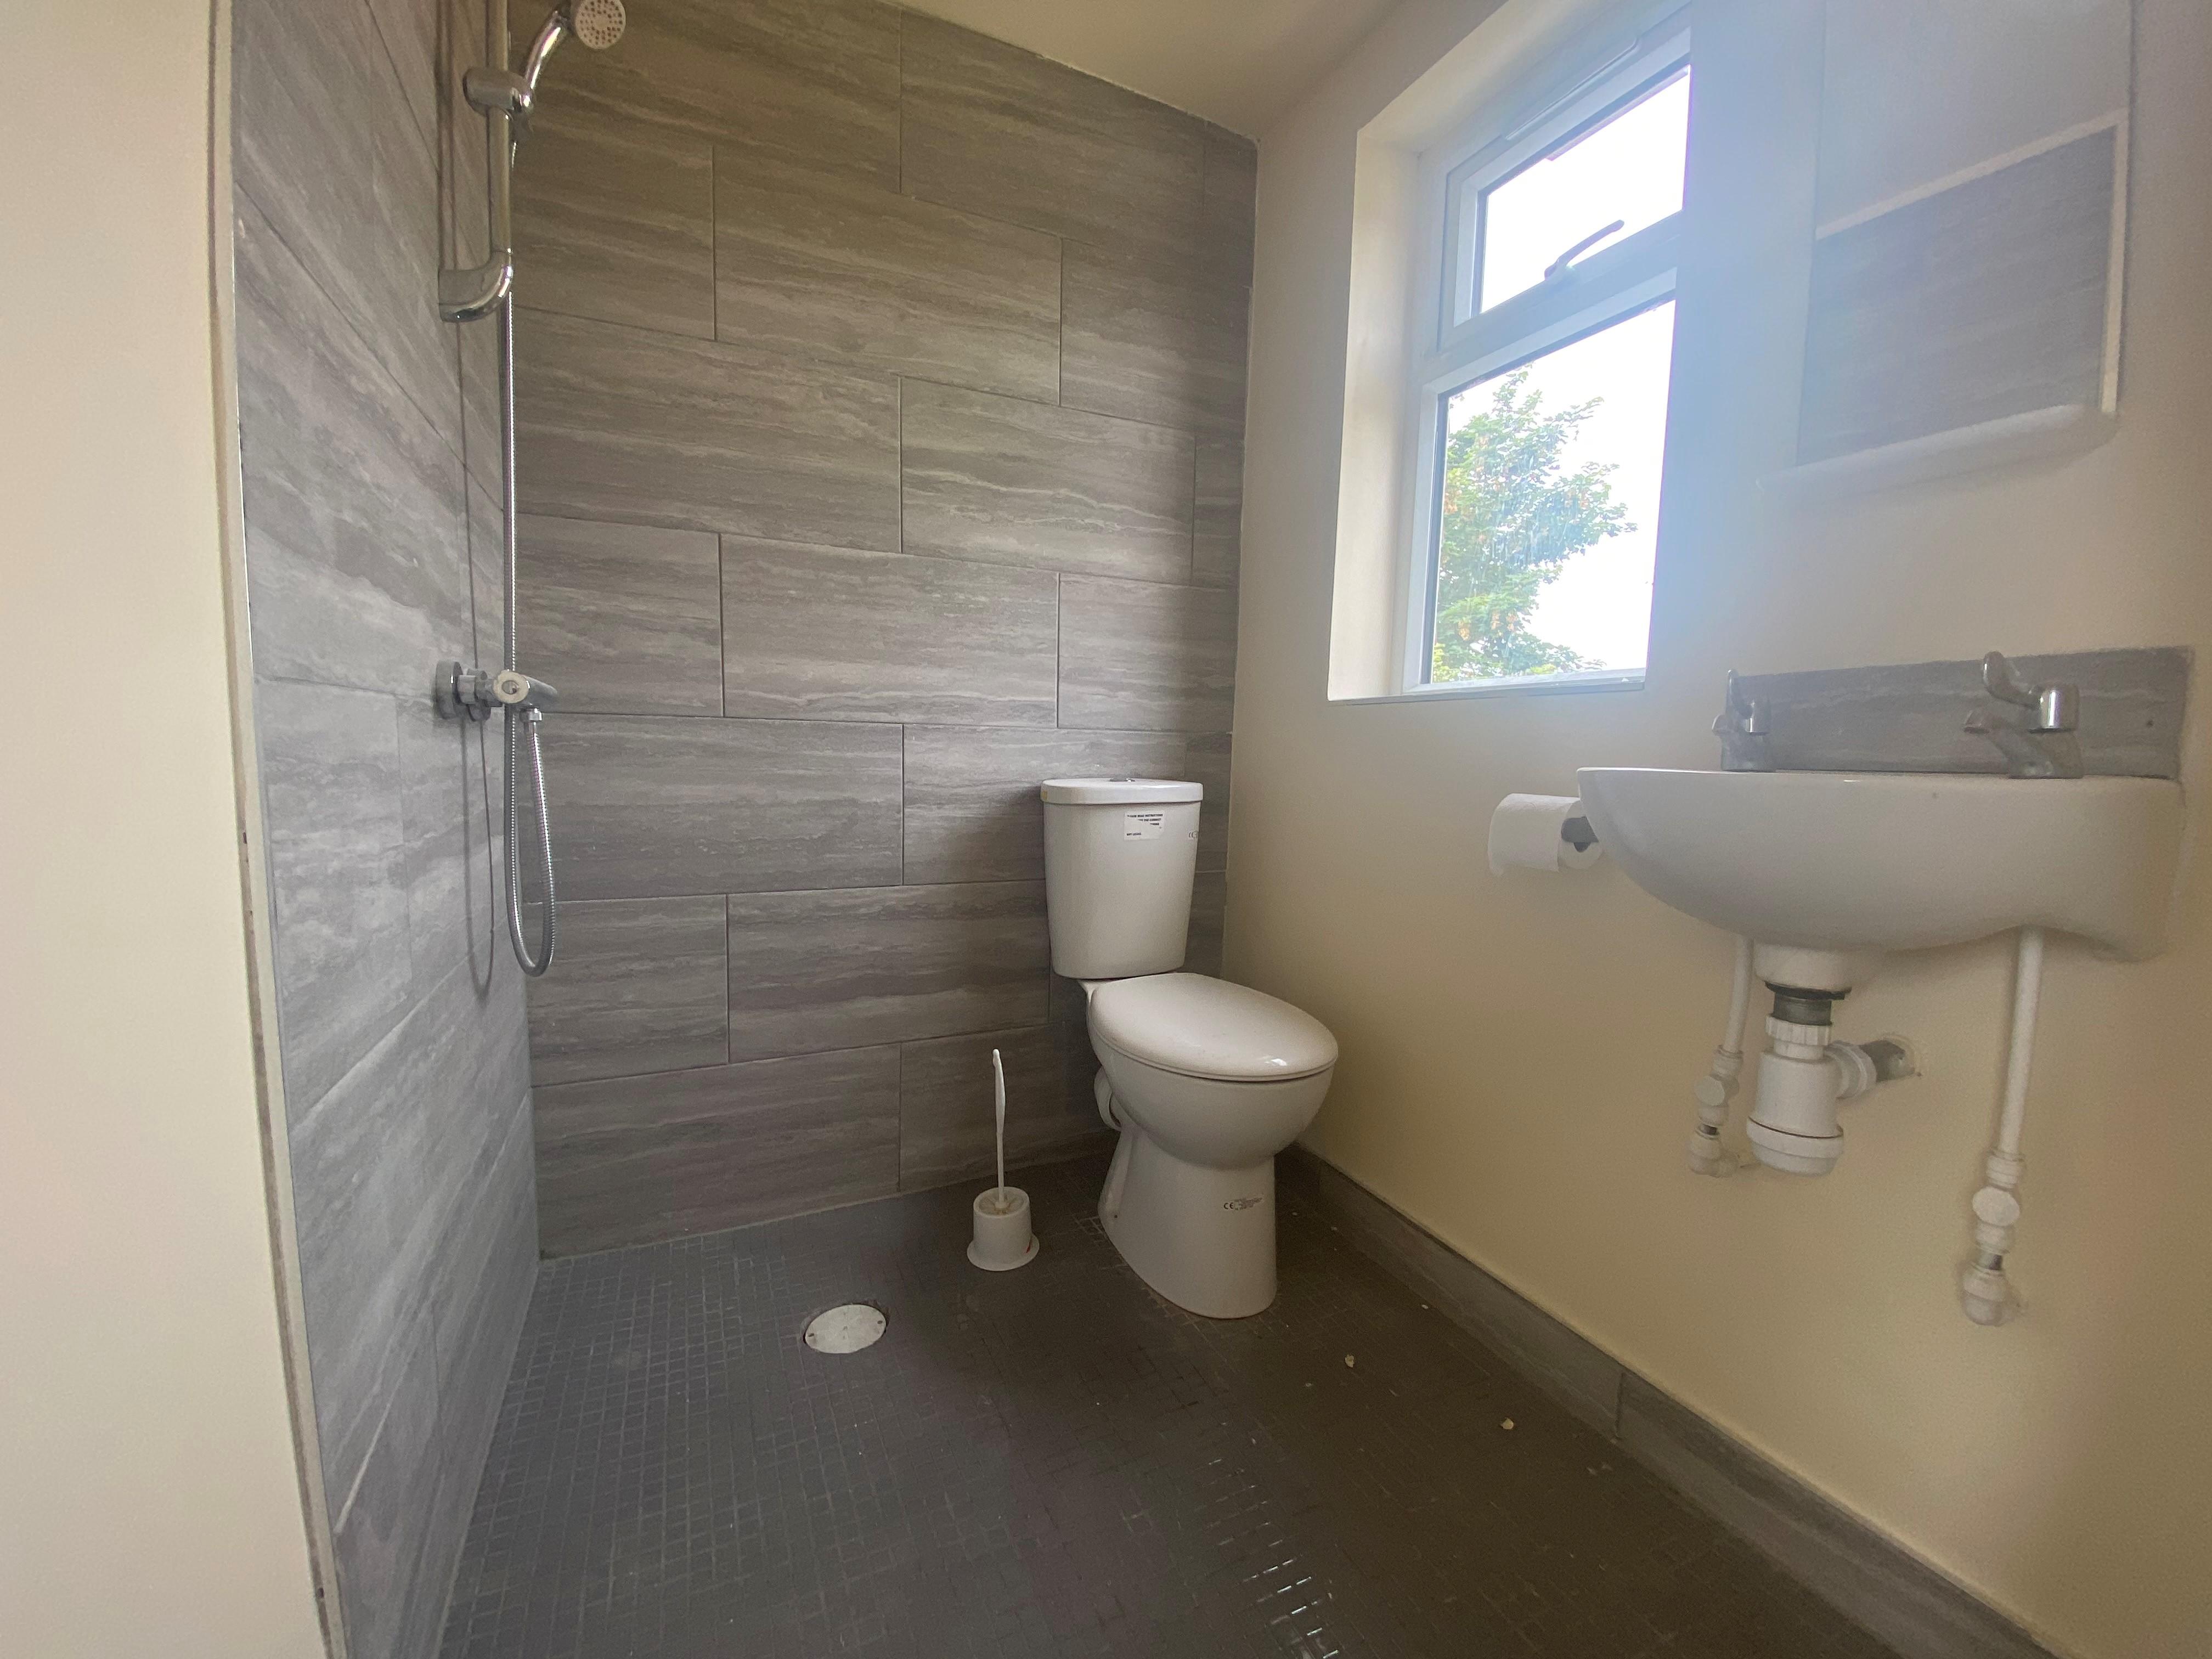 customer_1/branch_5/client_46189/sale_property/bathroom_1625830109.jpeg